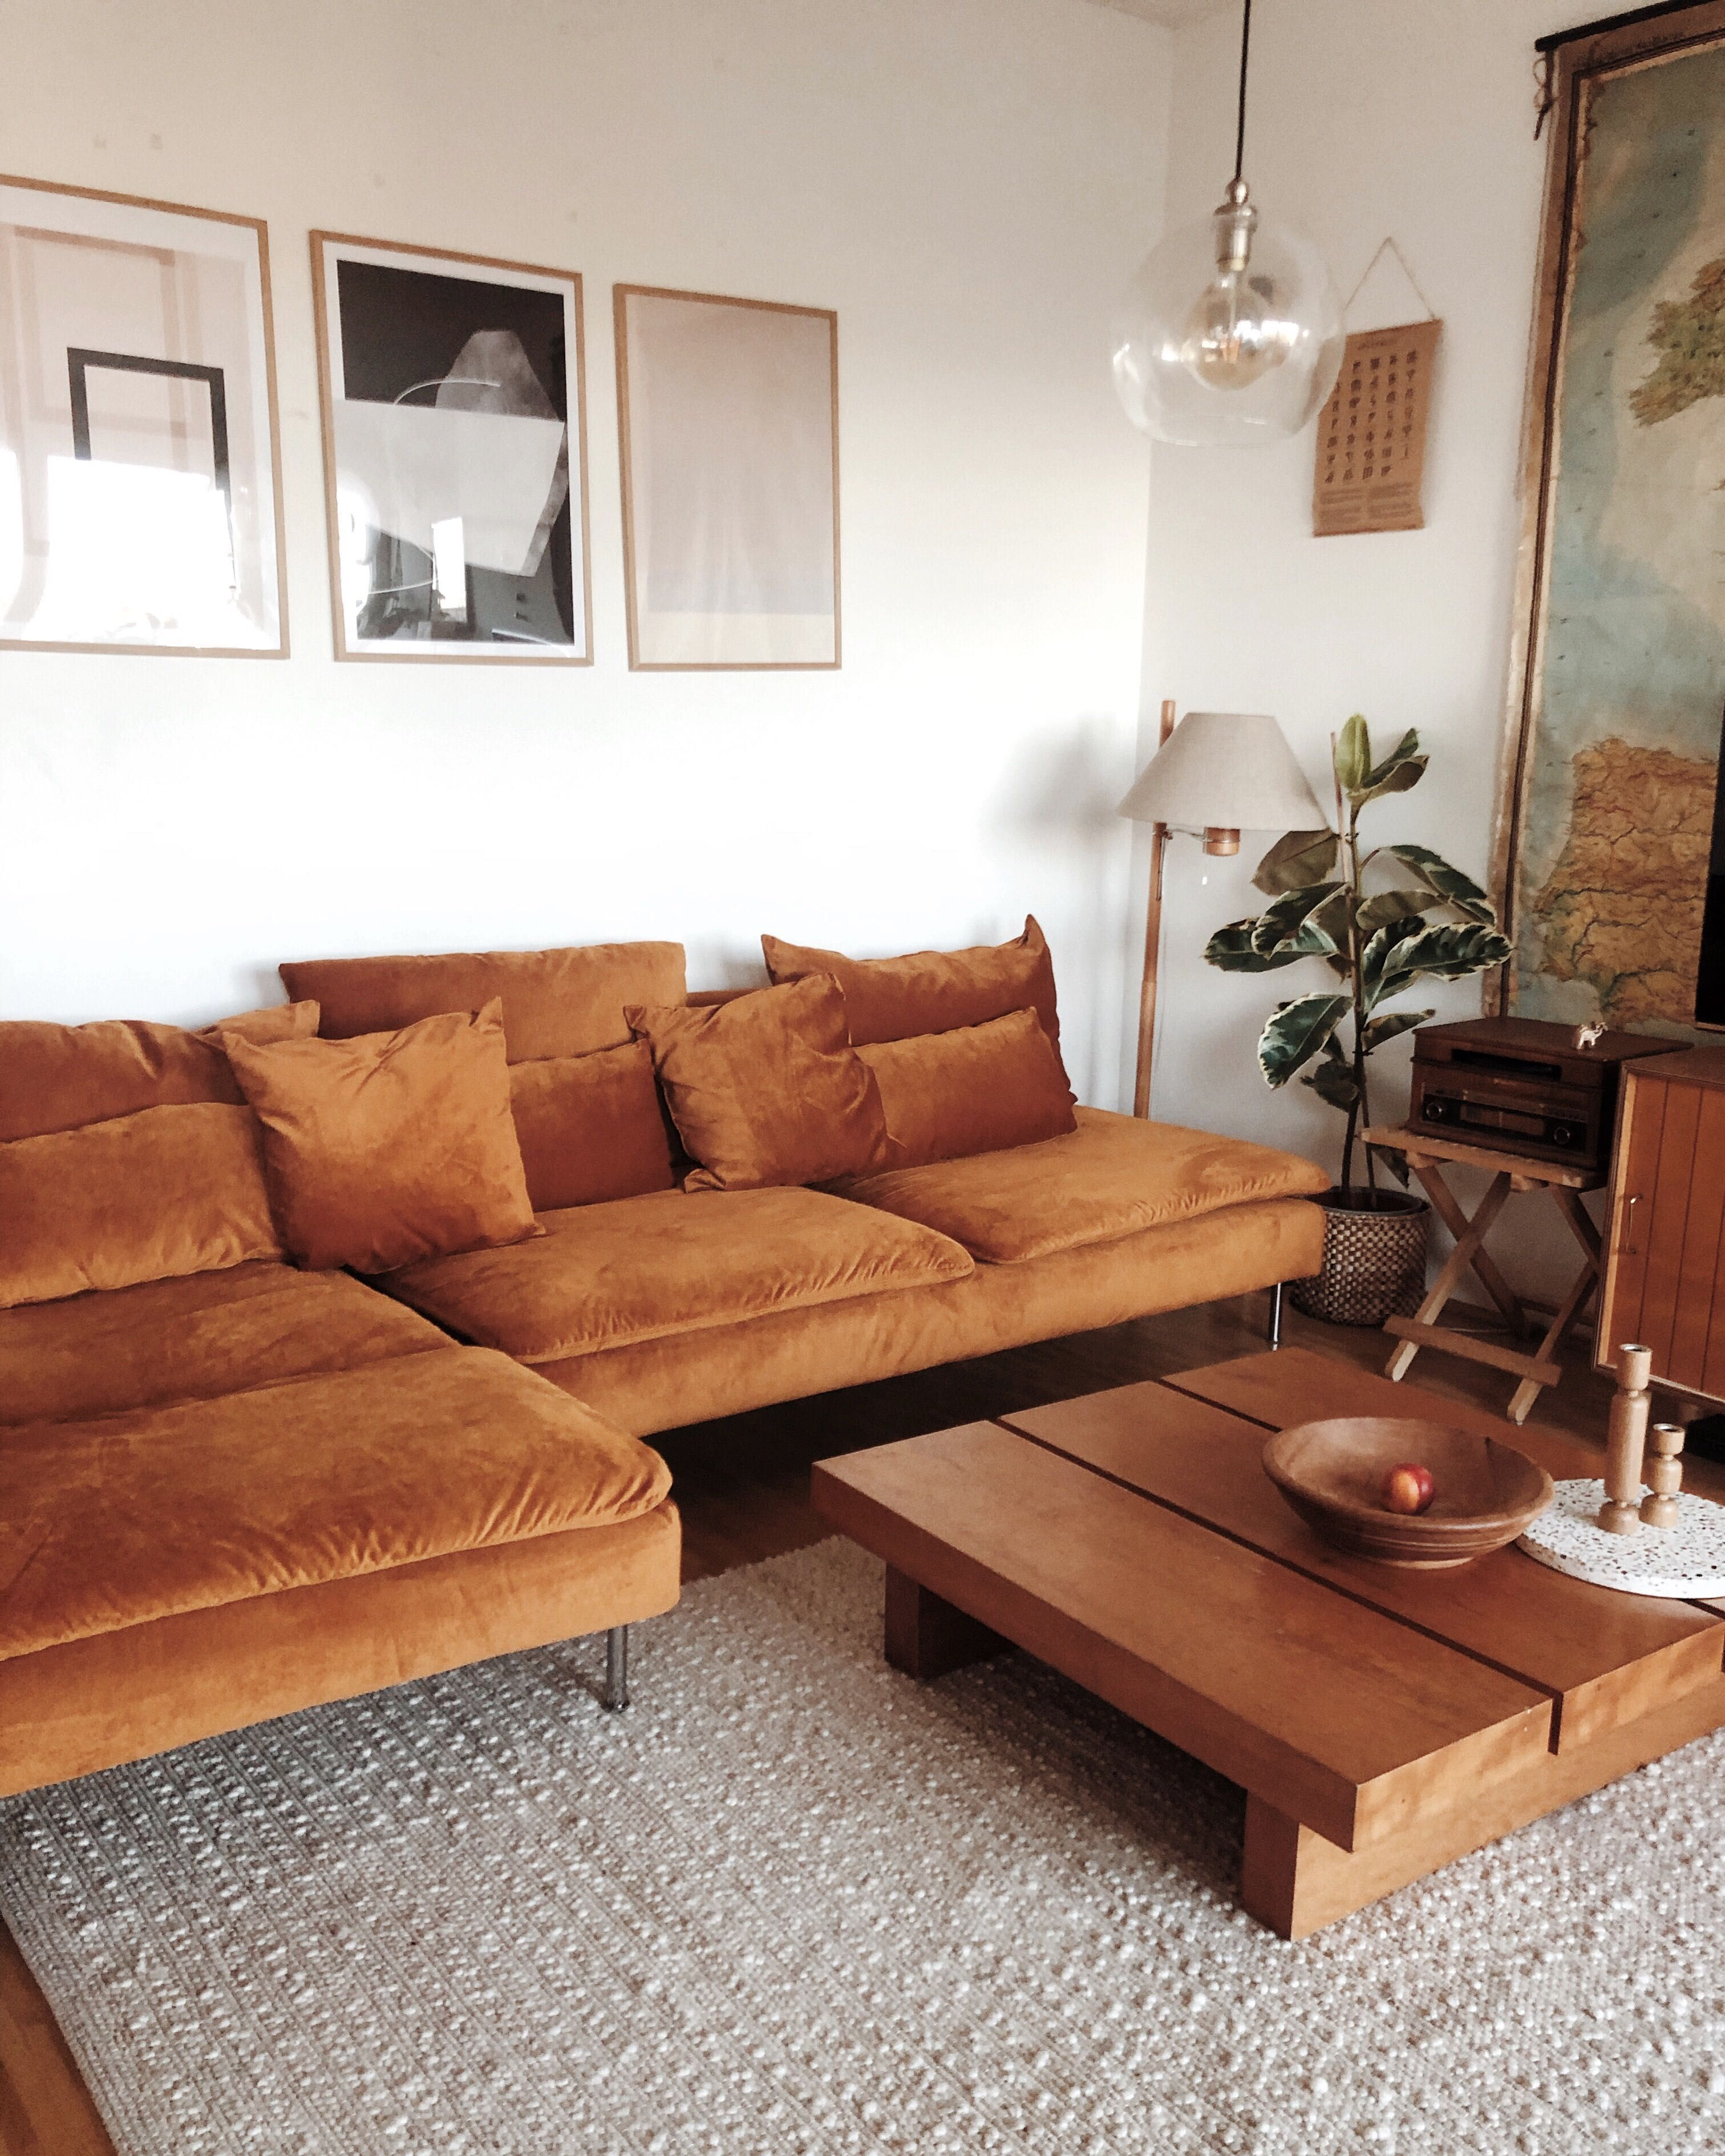 IKEA Söderhamn, Sofabezug mit 3 Sitzen – Bemz   Bemz